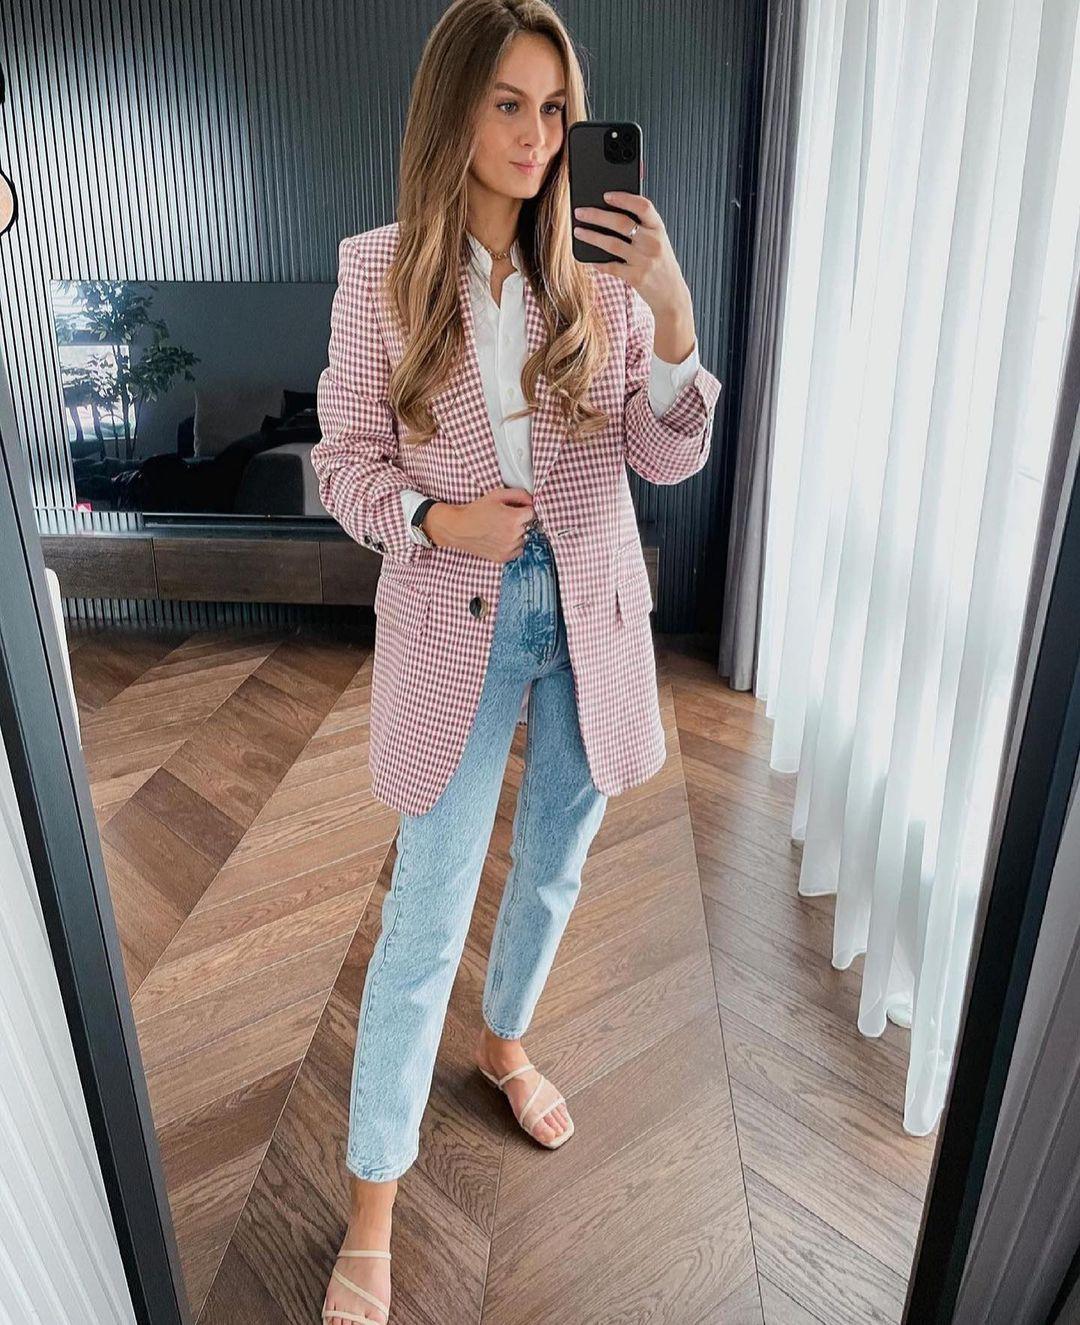 veste pied-de-poule de Zara sur zara.outfits